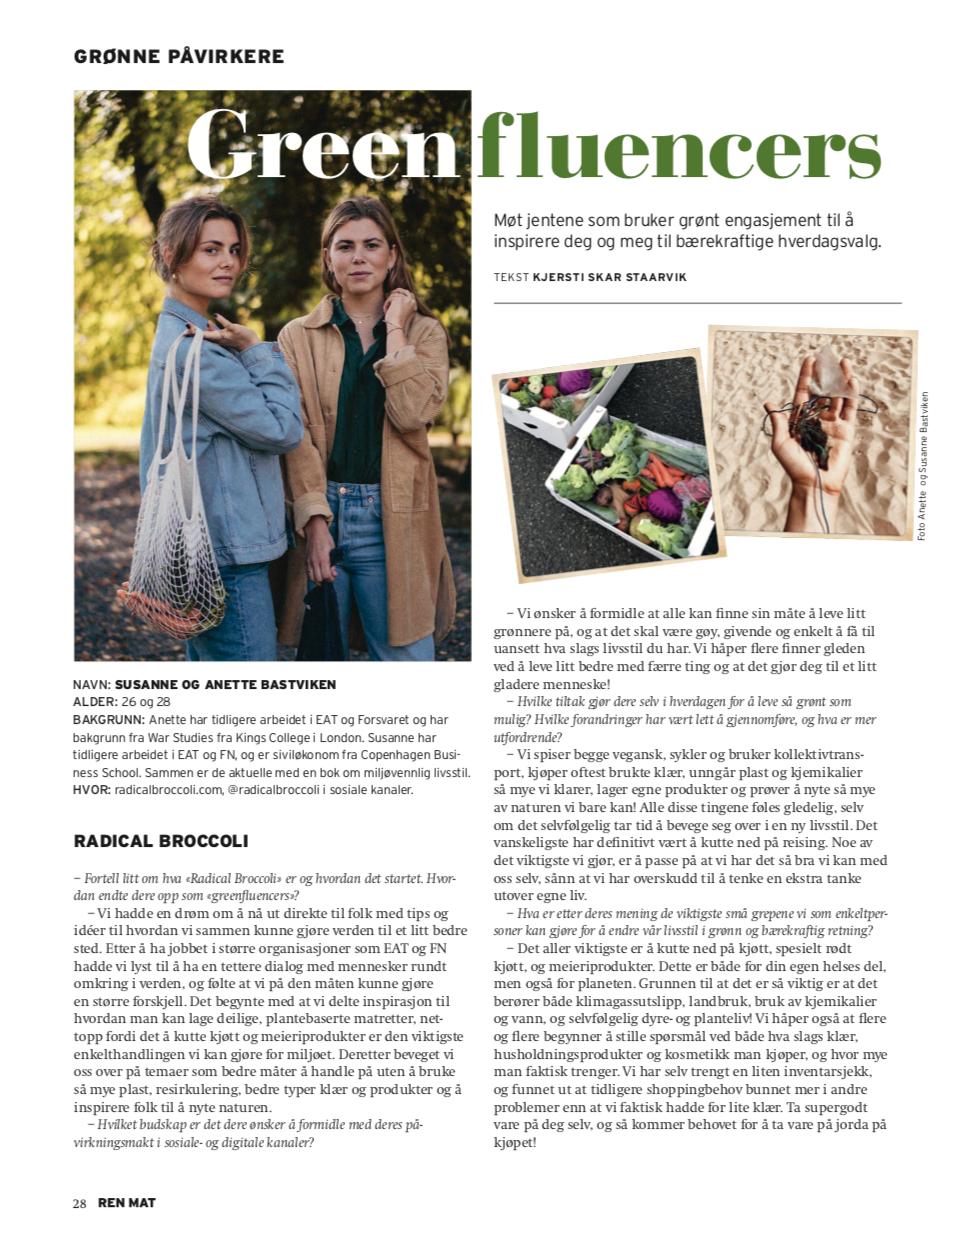 greenfluencers-ren-mat-radical-broccoli